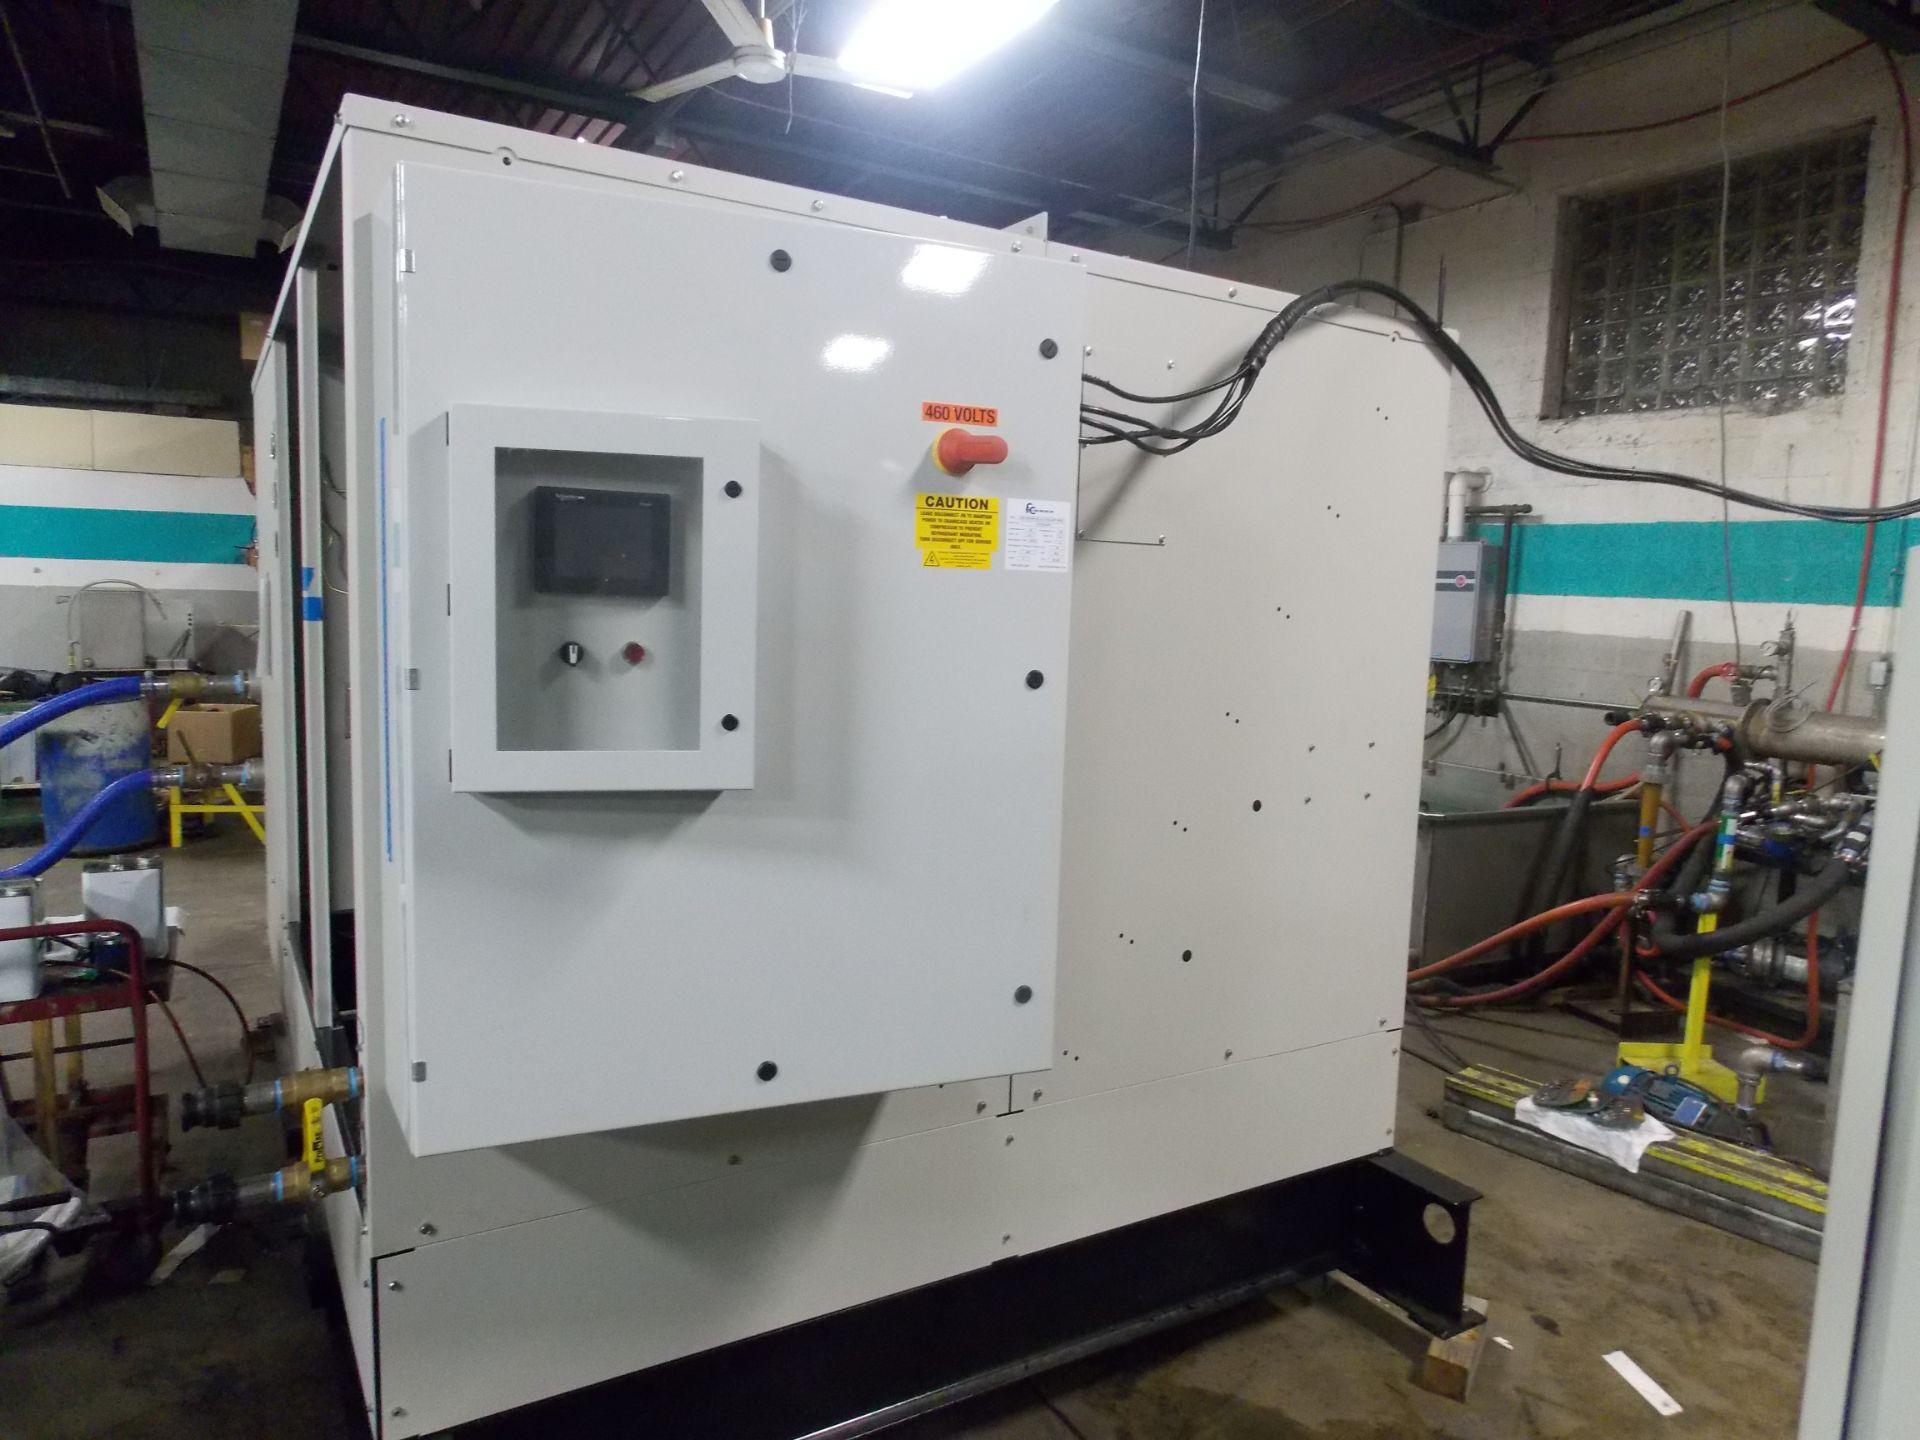 Unused-Fluid Chillers Inc -40 C Water-Cooled Fluid Chiller. Model WAT50,000-DC-ULT-RS. Cap: 42.4 kW - Image 2 of 7